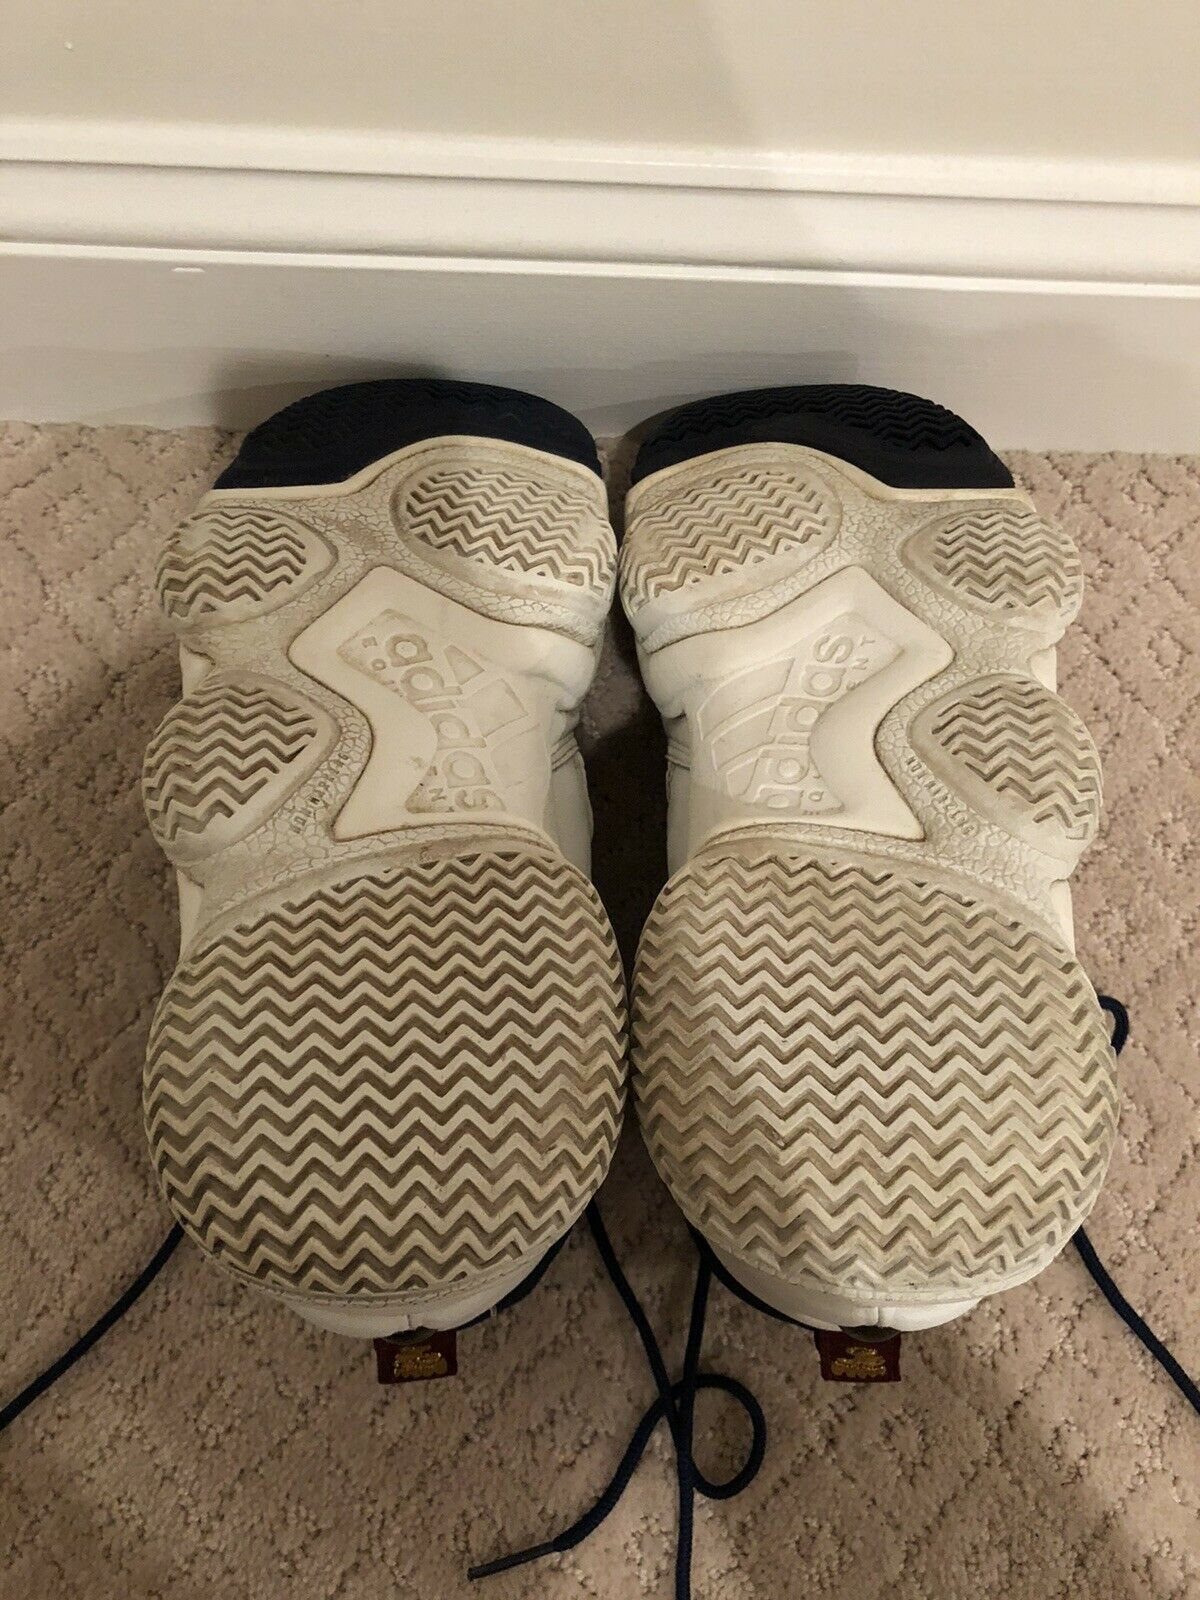 Kobe Bryant Adidas Sneakers. - image 4